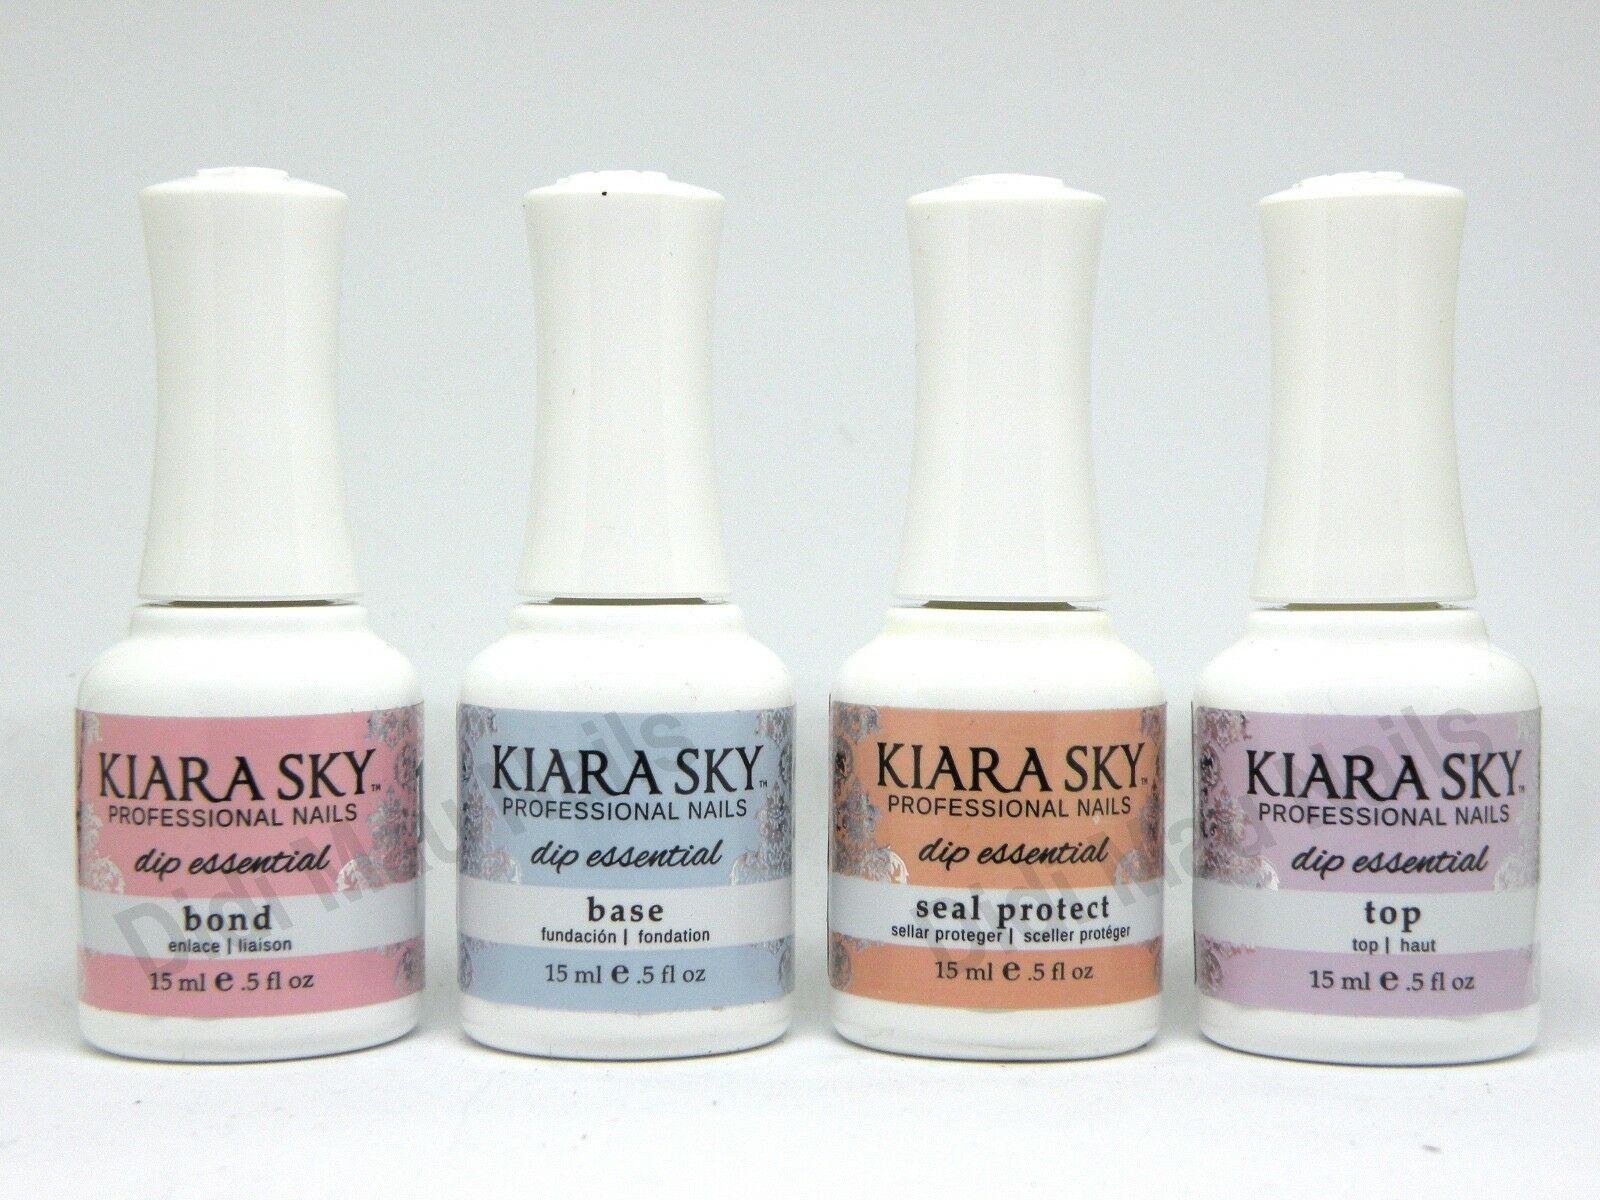 Kiara Sky Dipping Powder Essentials Kit Steps 1-4 0.5oz